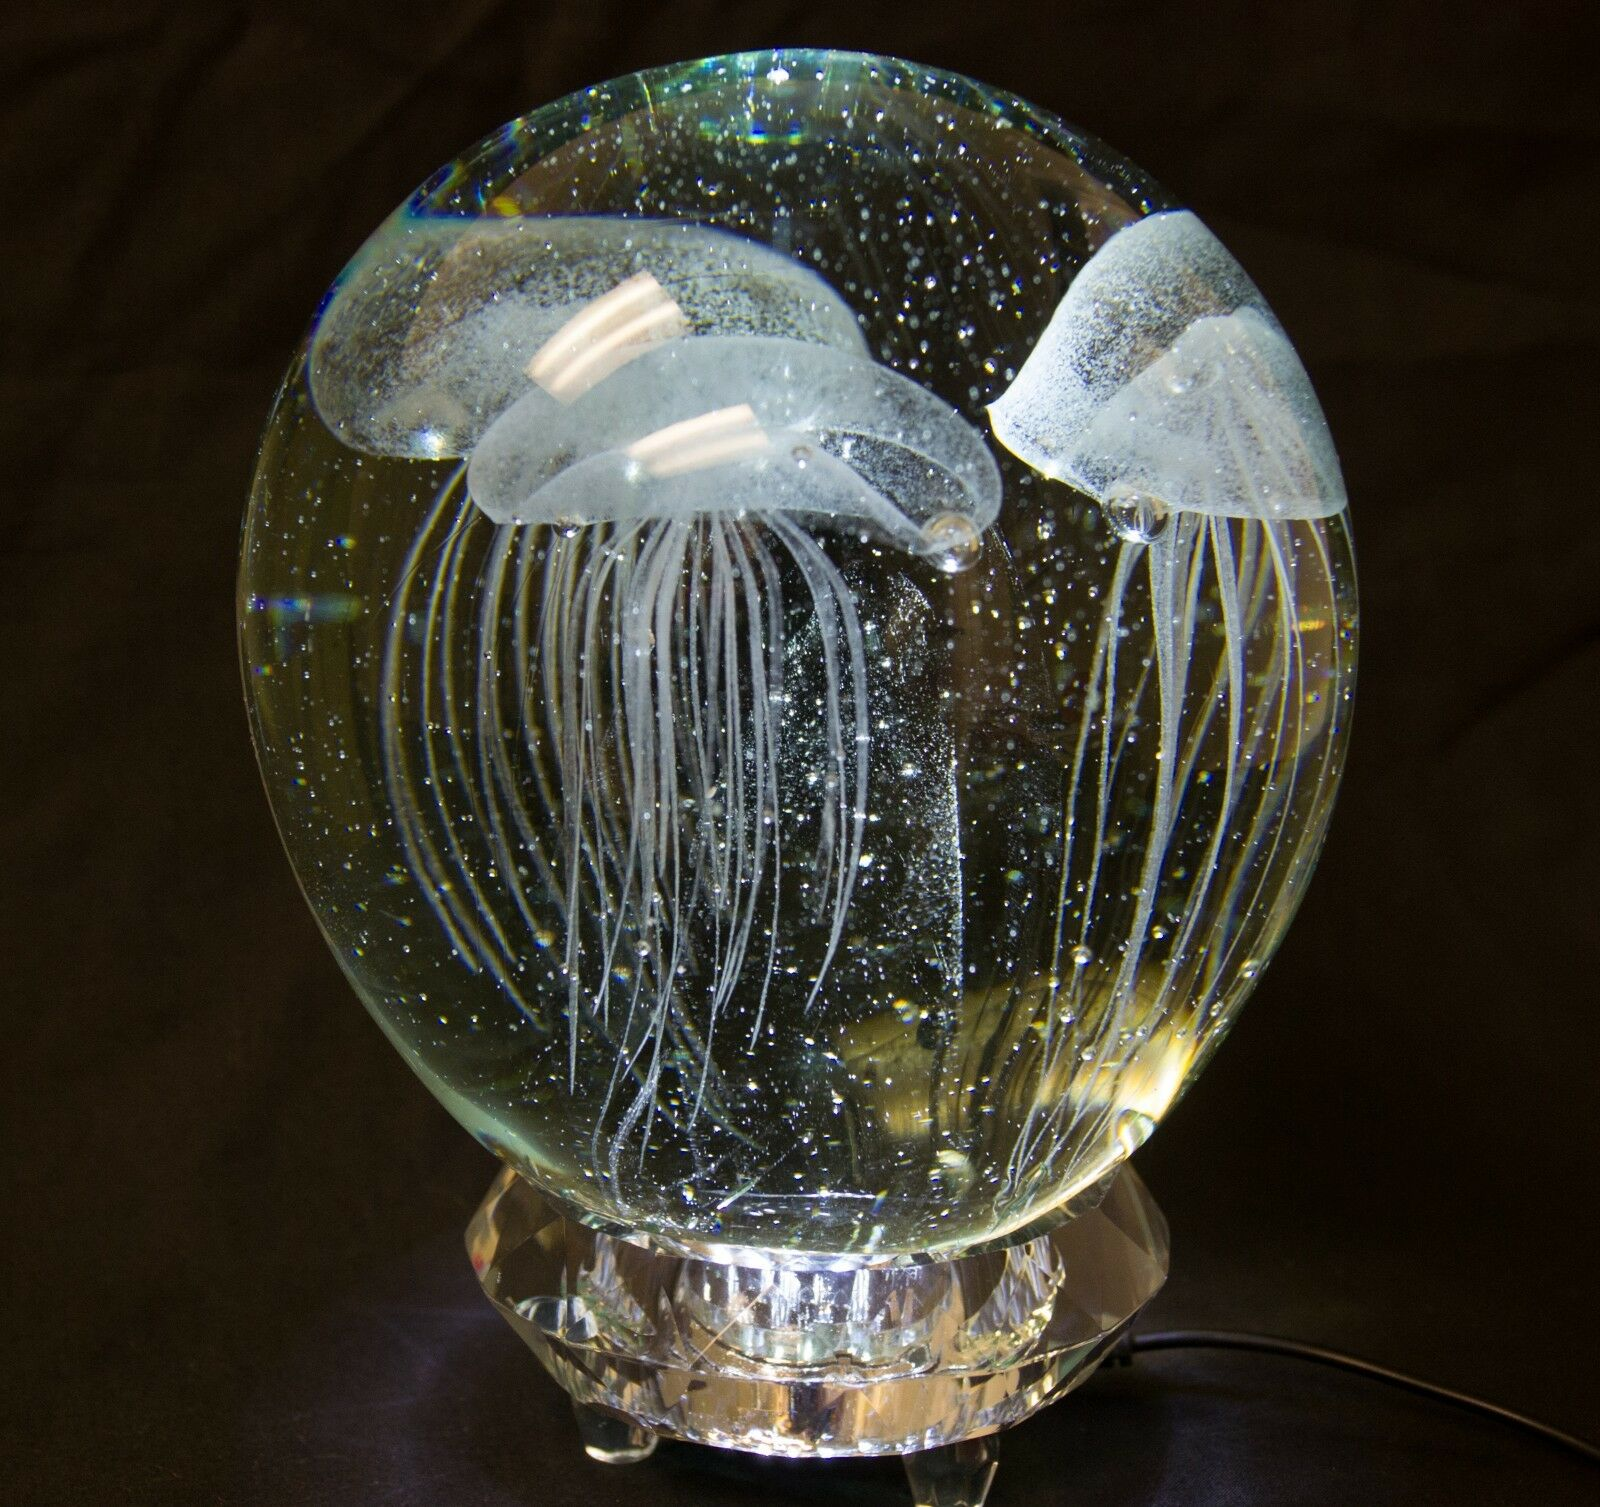 Glass Jellyfish paper weight, glowing in the dark, 5.5  tall, 3 Weiß jellyfish